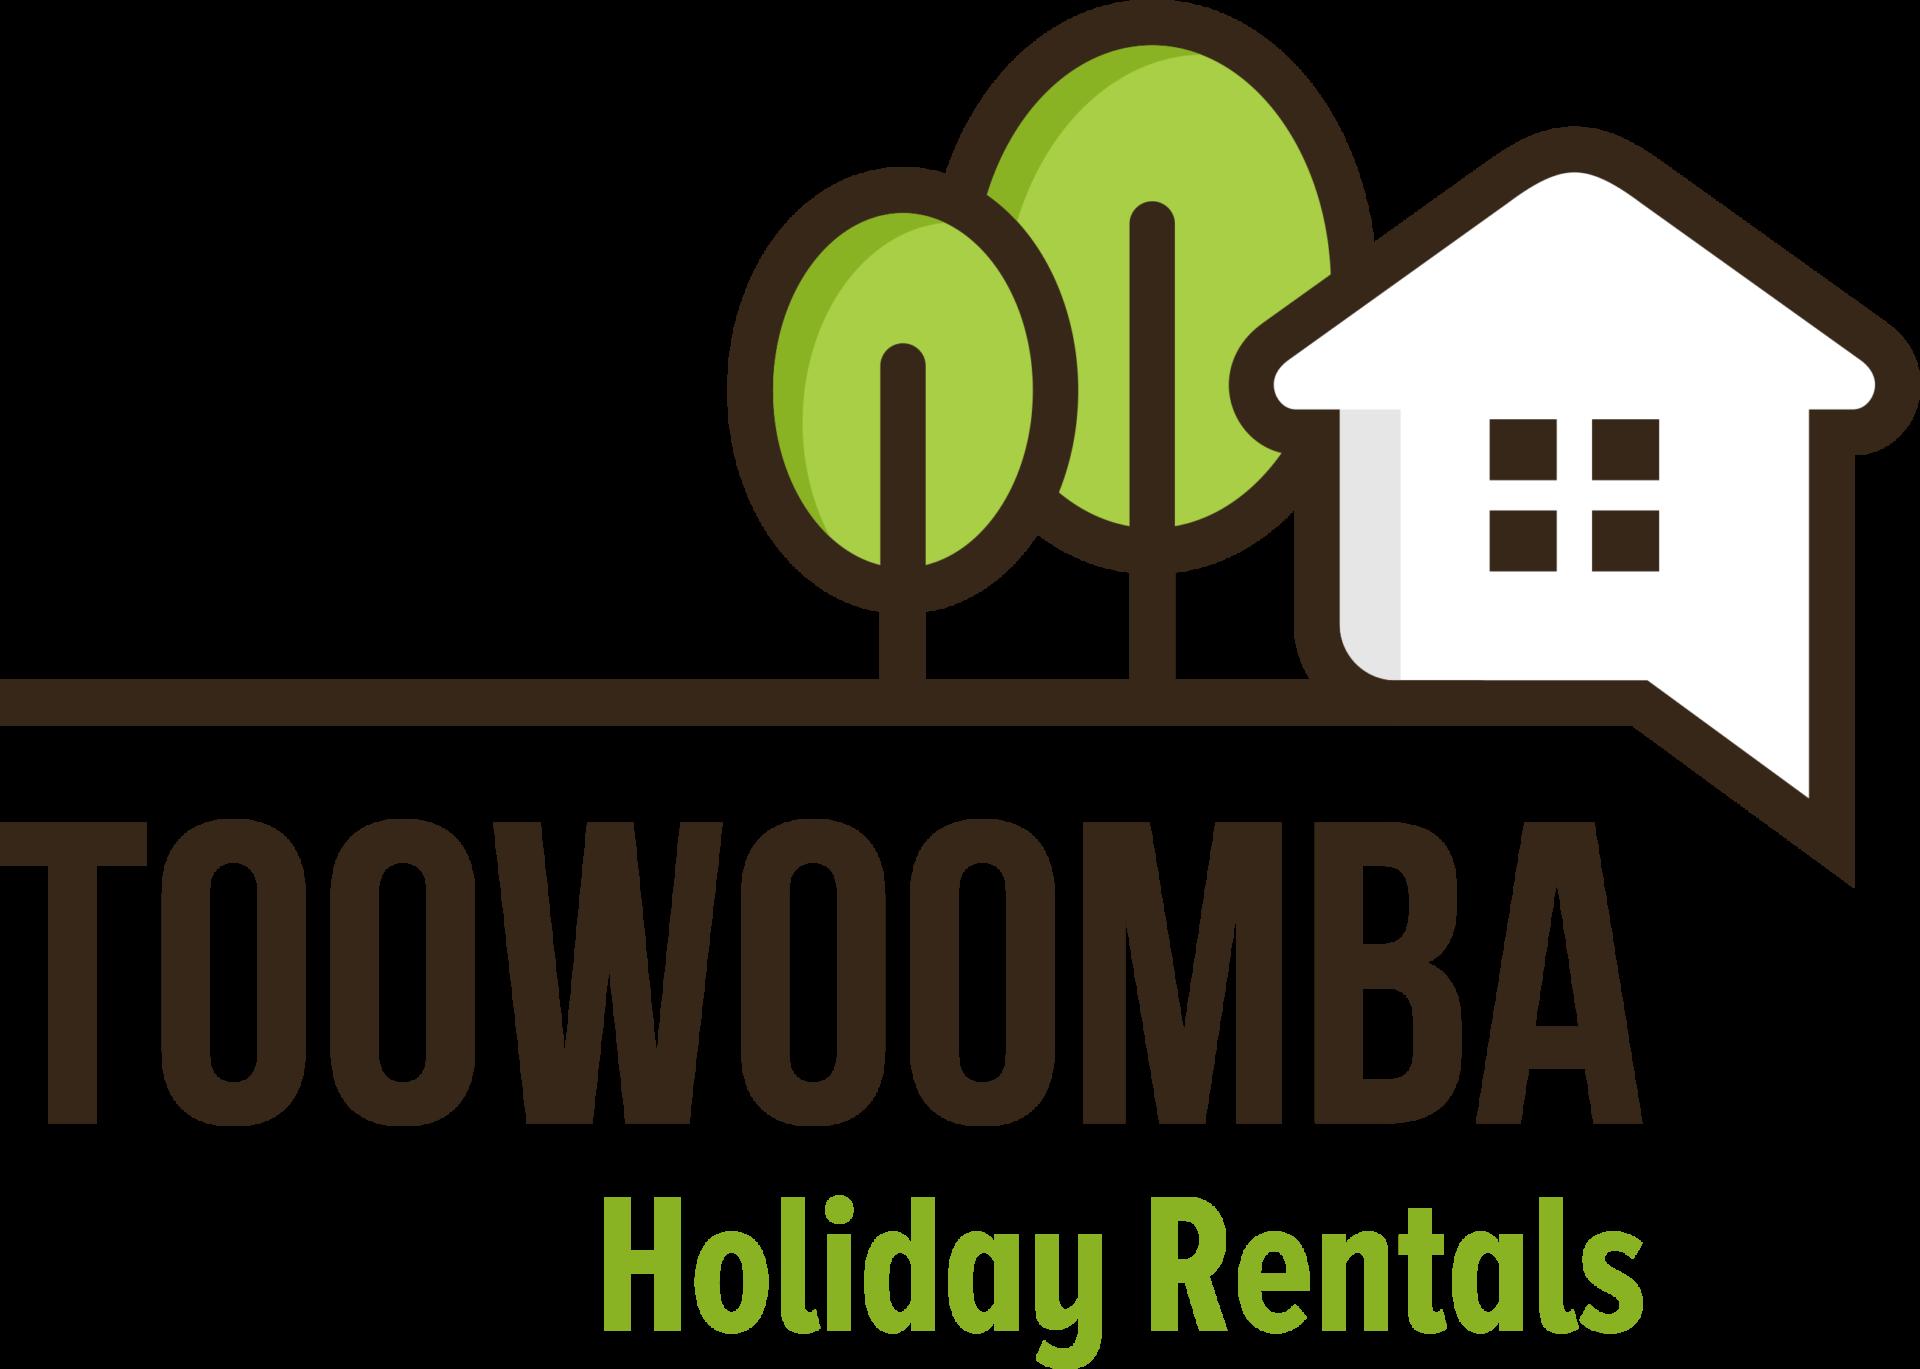 Toowoomba Holiday Rentals